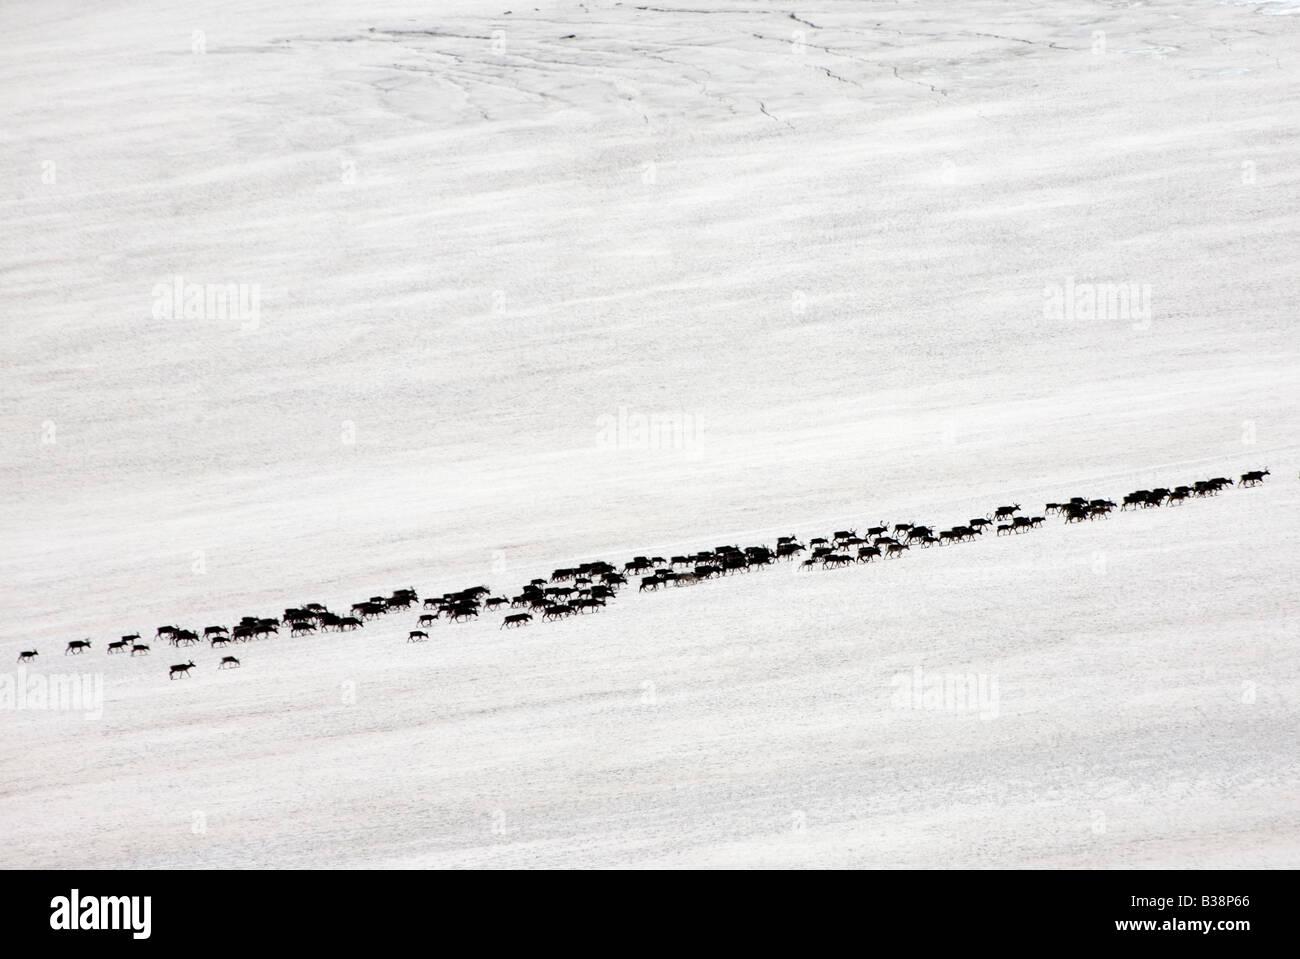 Norway Jotunheimen fjell Galdhöpiggen reindeer on glacier summer 2008 - Stock Image